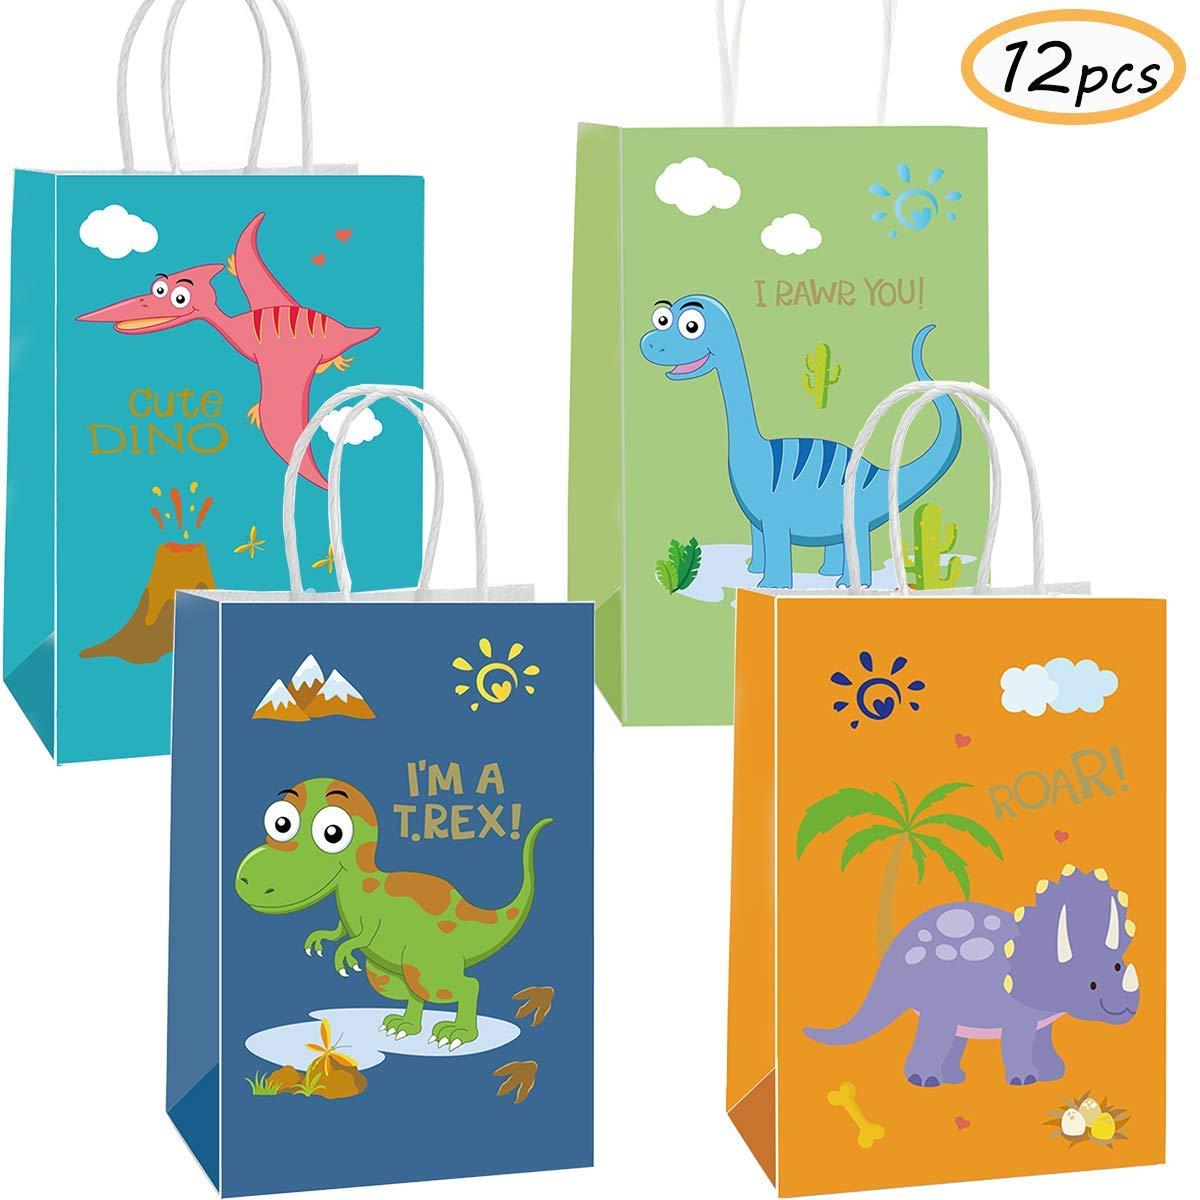 Funnlot Dinosaur Party Bags Dino Gift Bags Dinosaur Goodies Bags Dino Kids Birthday T-Rex Roar Party Supplies (12 pcs Dinosaur Gift Bags)